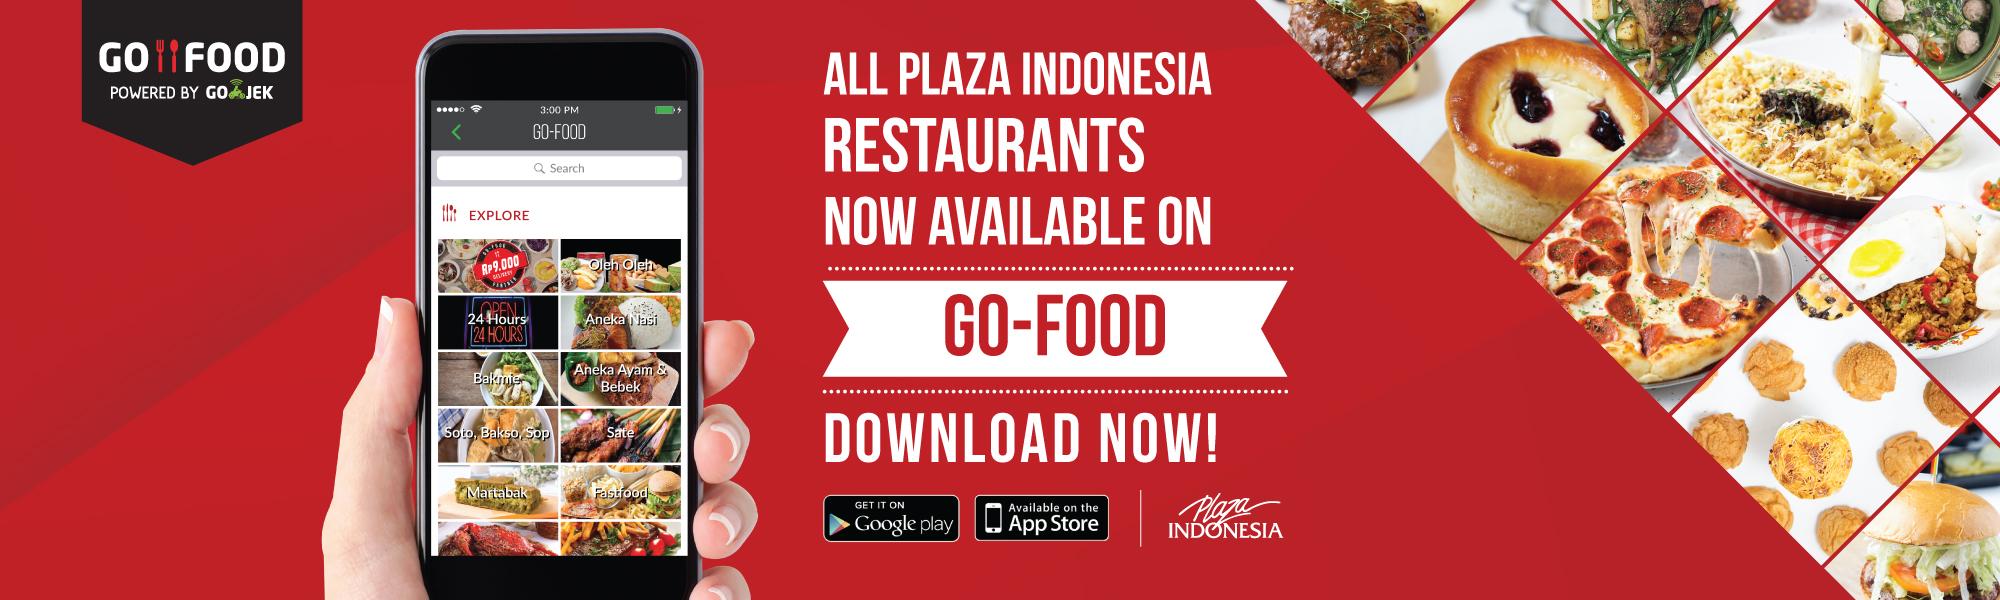 Semua Restaurant di Plaza Indonesia ada di GO-FOOD | GO-FOOD